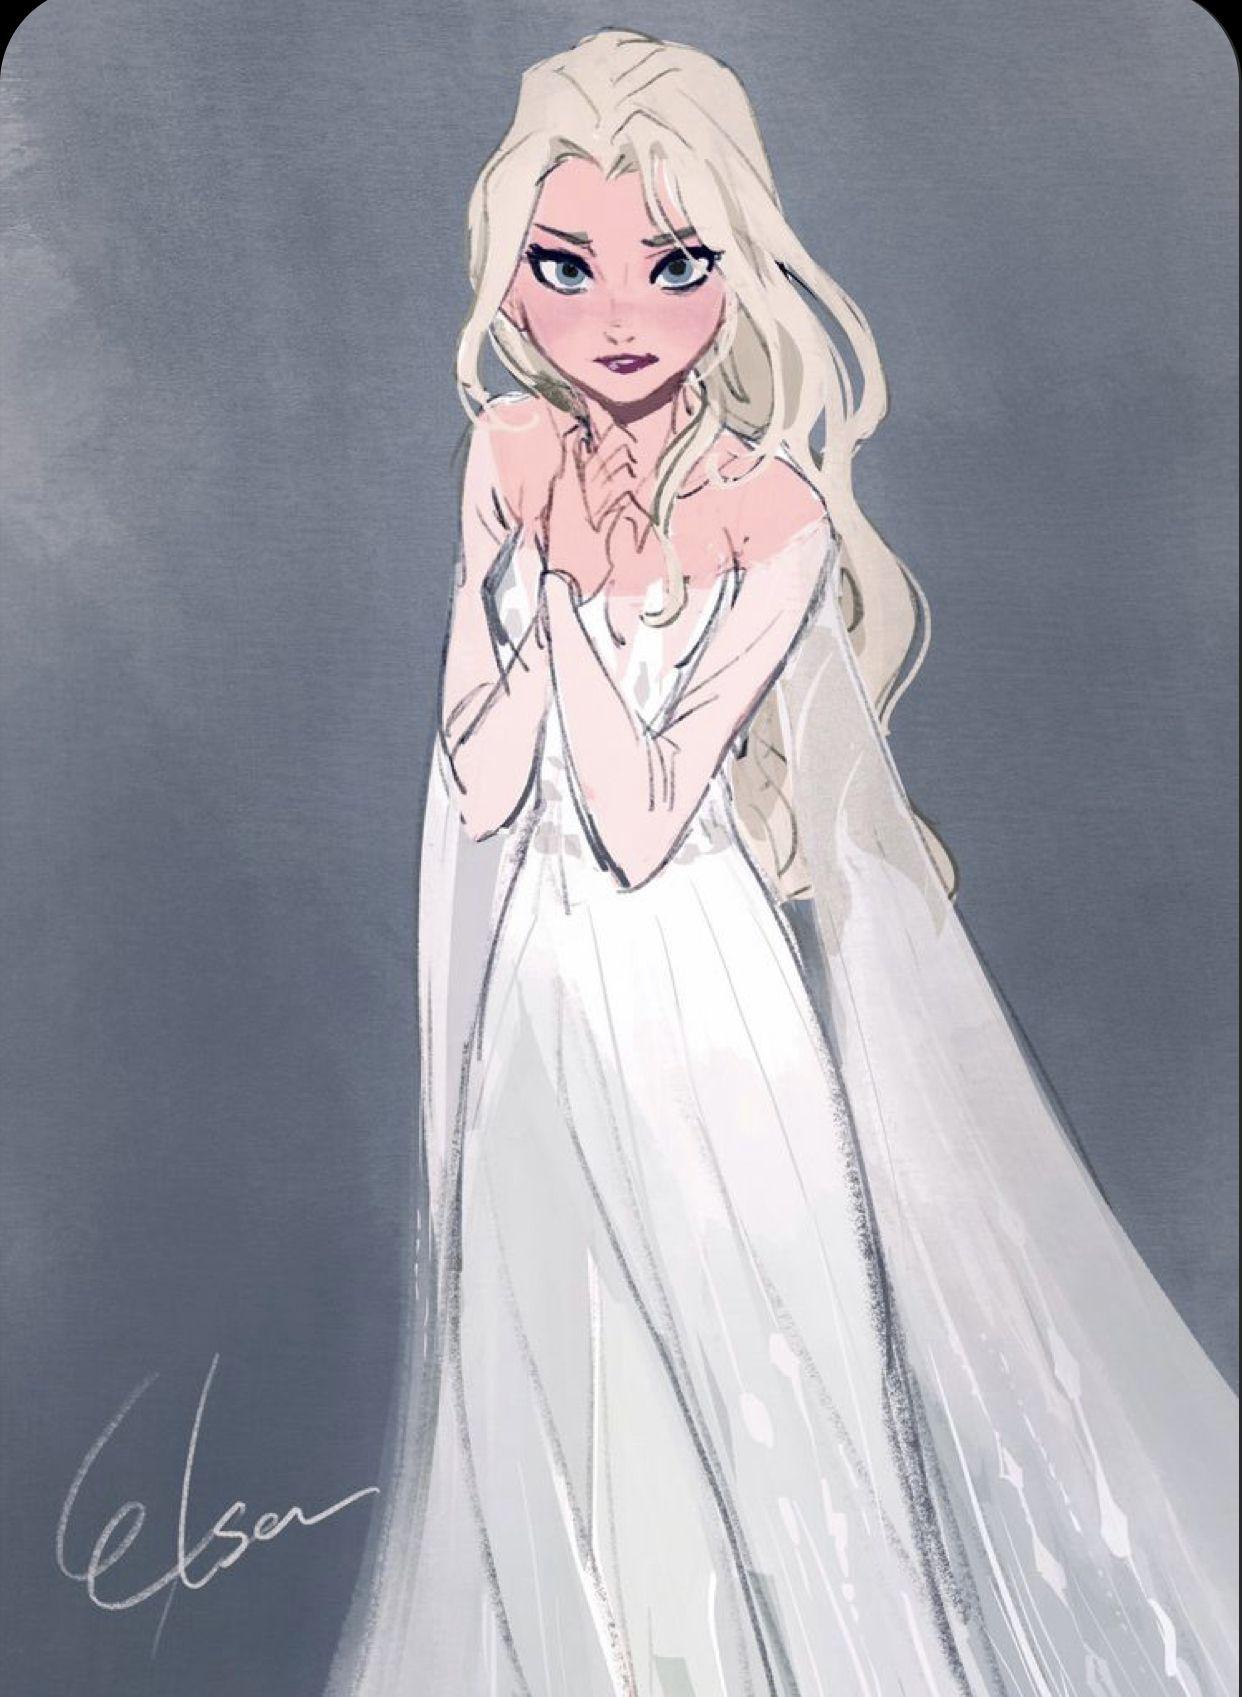 Pin By Ariadne Herrera On Disney Disney Drawings Disney Princess Art Disney Princess Wallpaper